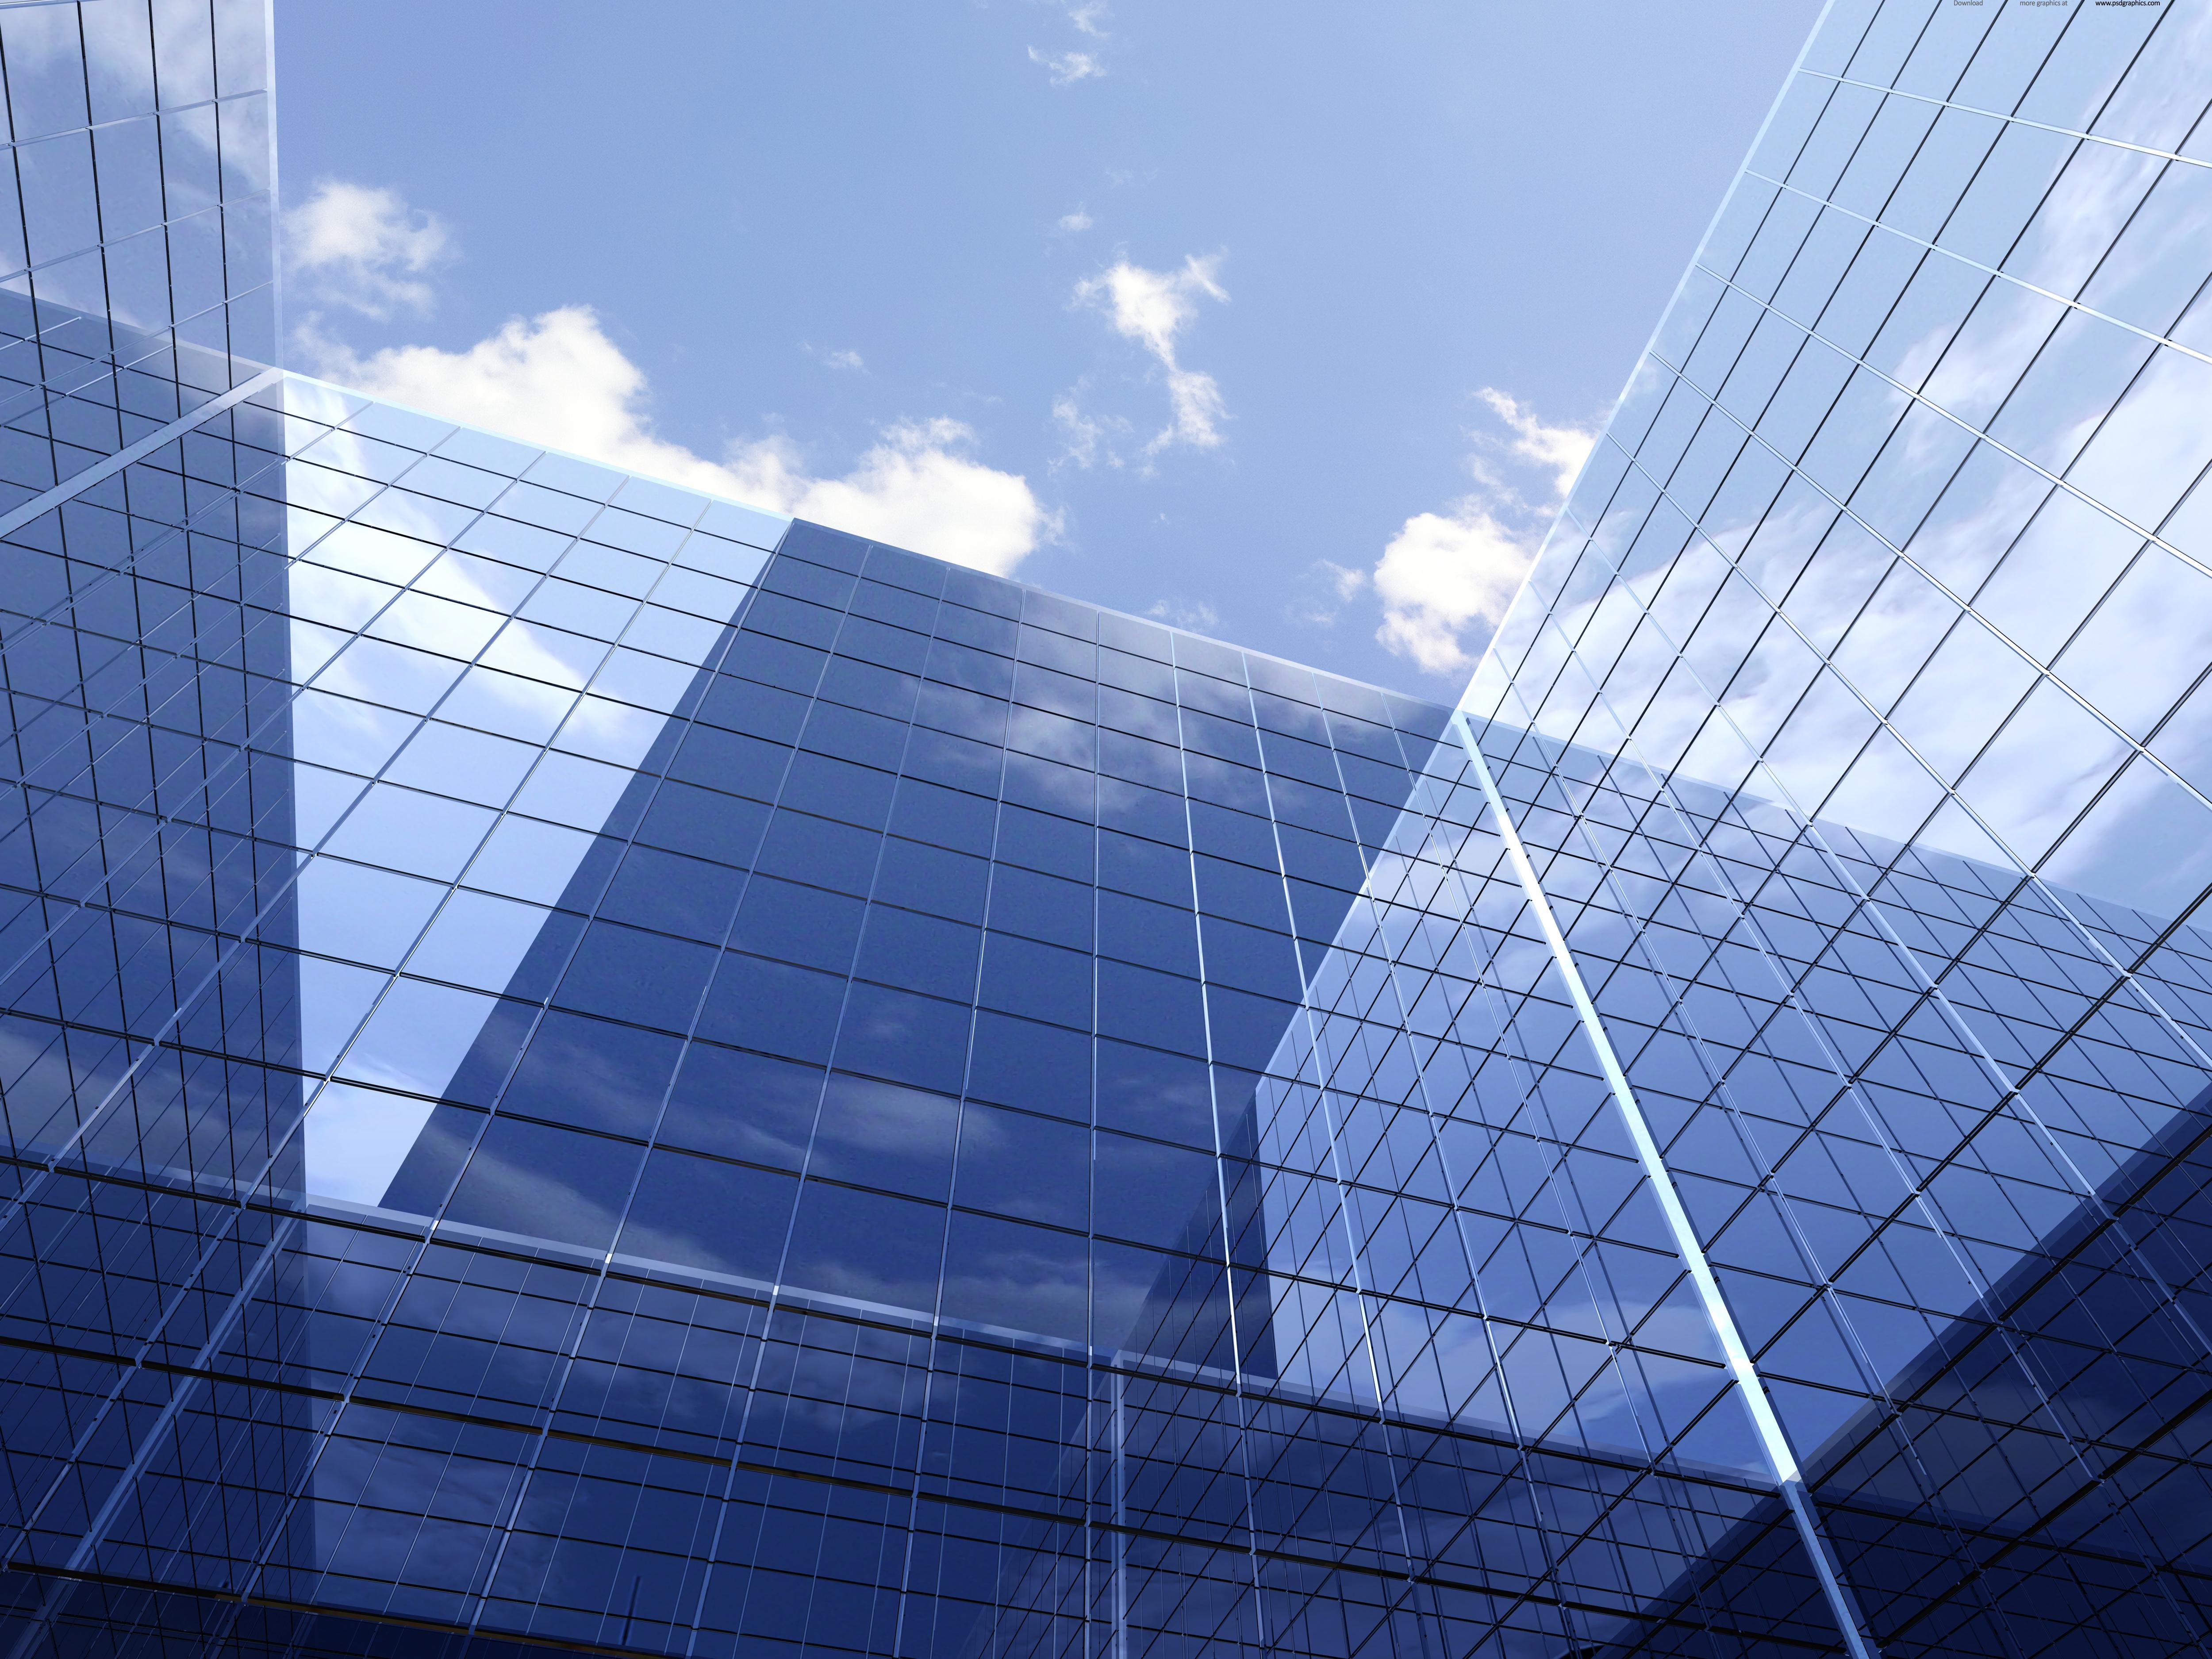 dea8a7dde9d Abstract glass building